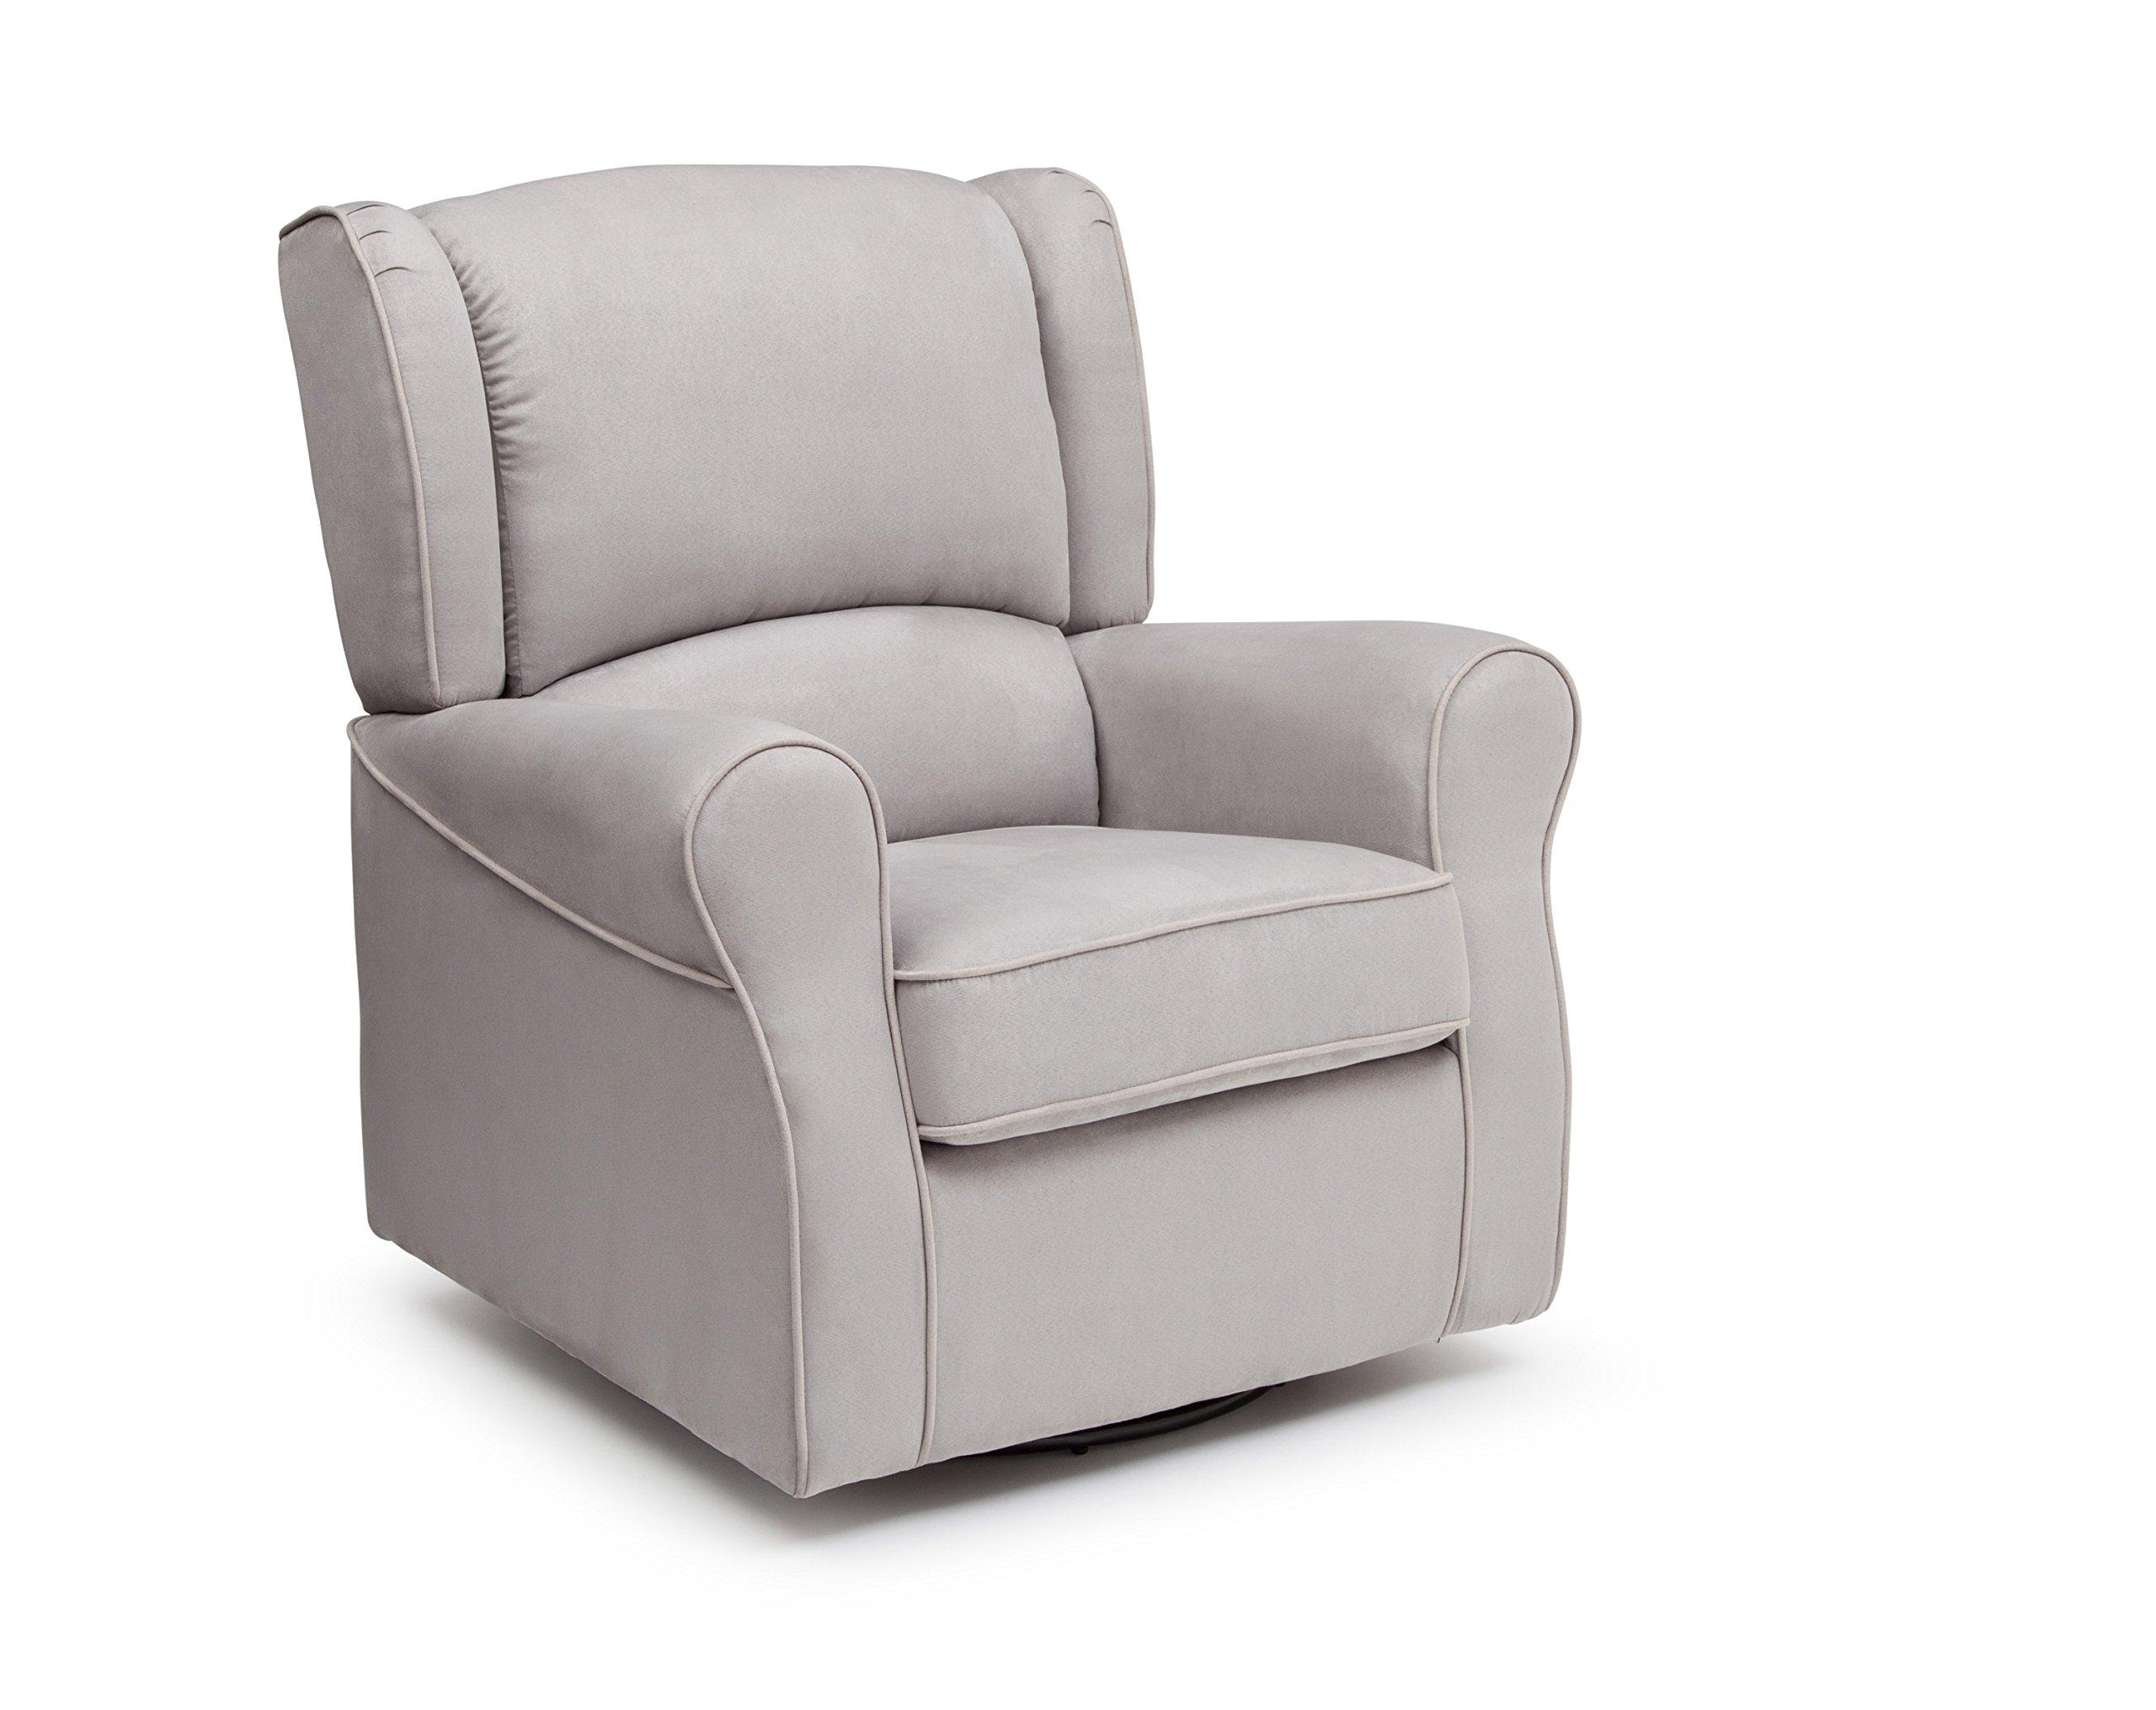 Delta Furniture Morgan Upholstered Glider Swivel Rocker Chair, Dove Grey